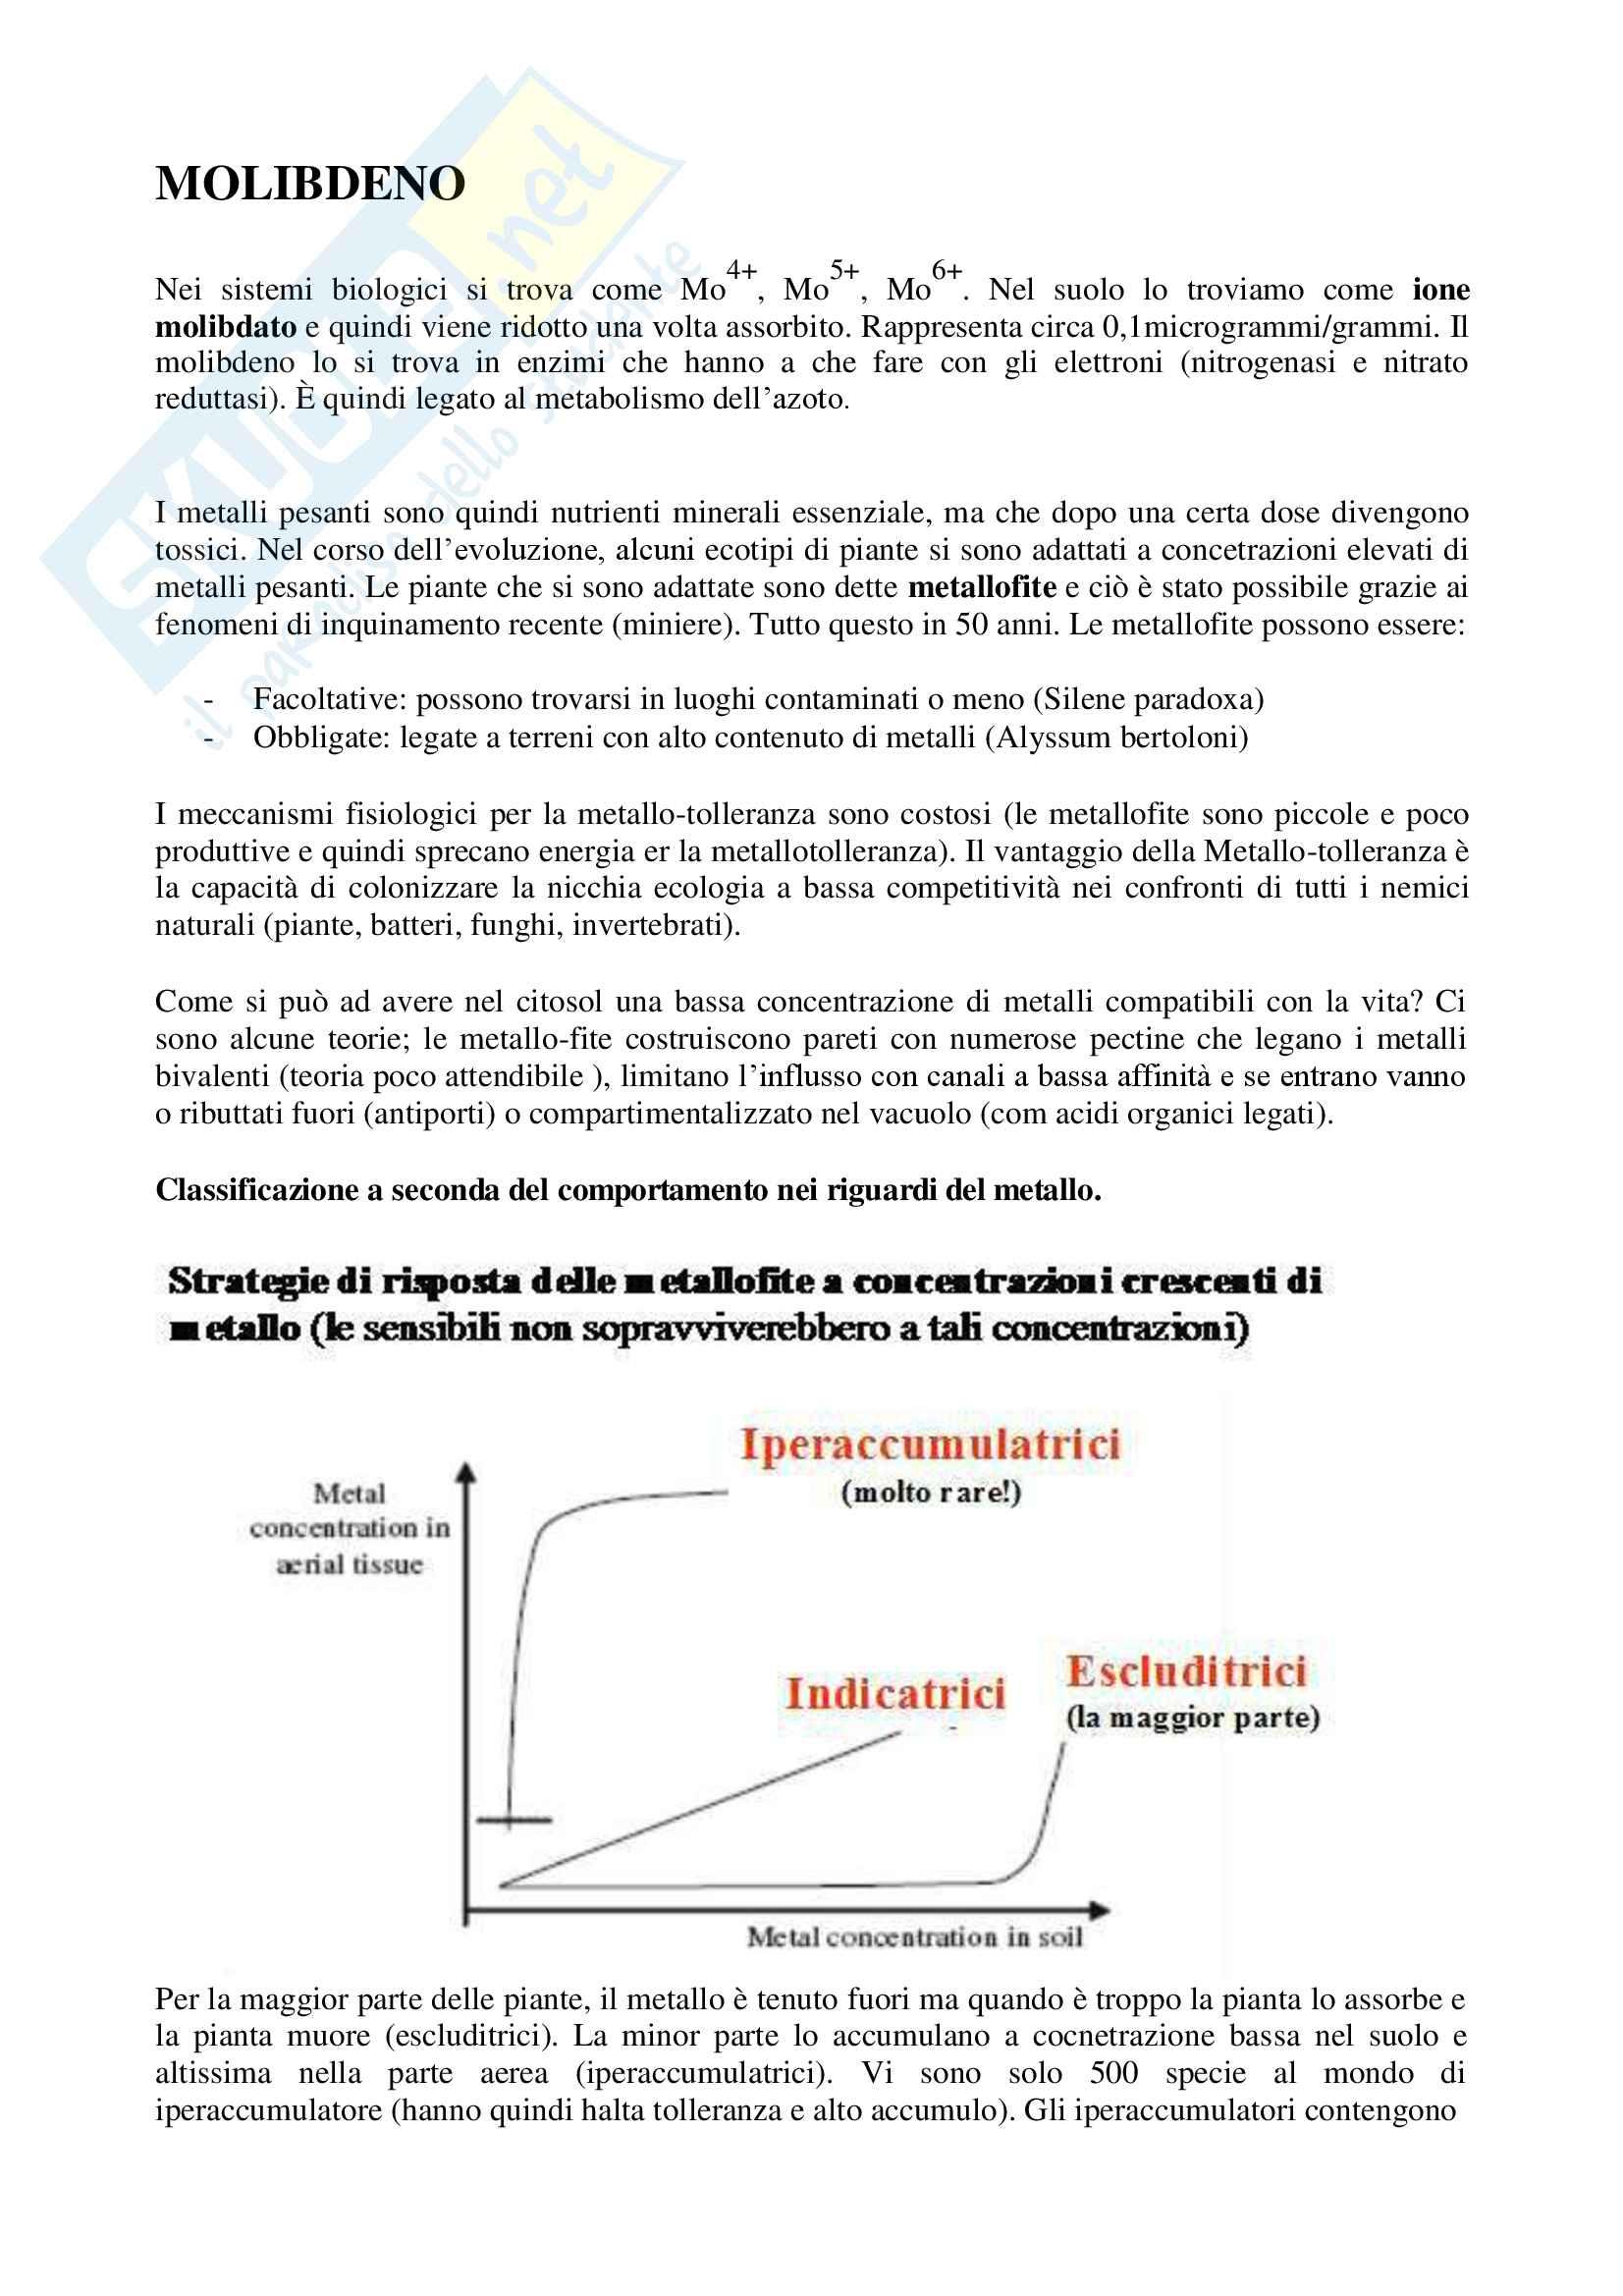 Fisiologia Vegetale Pag. 76